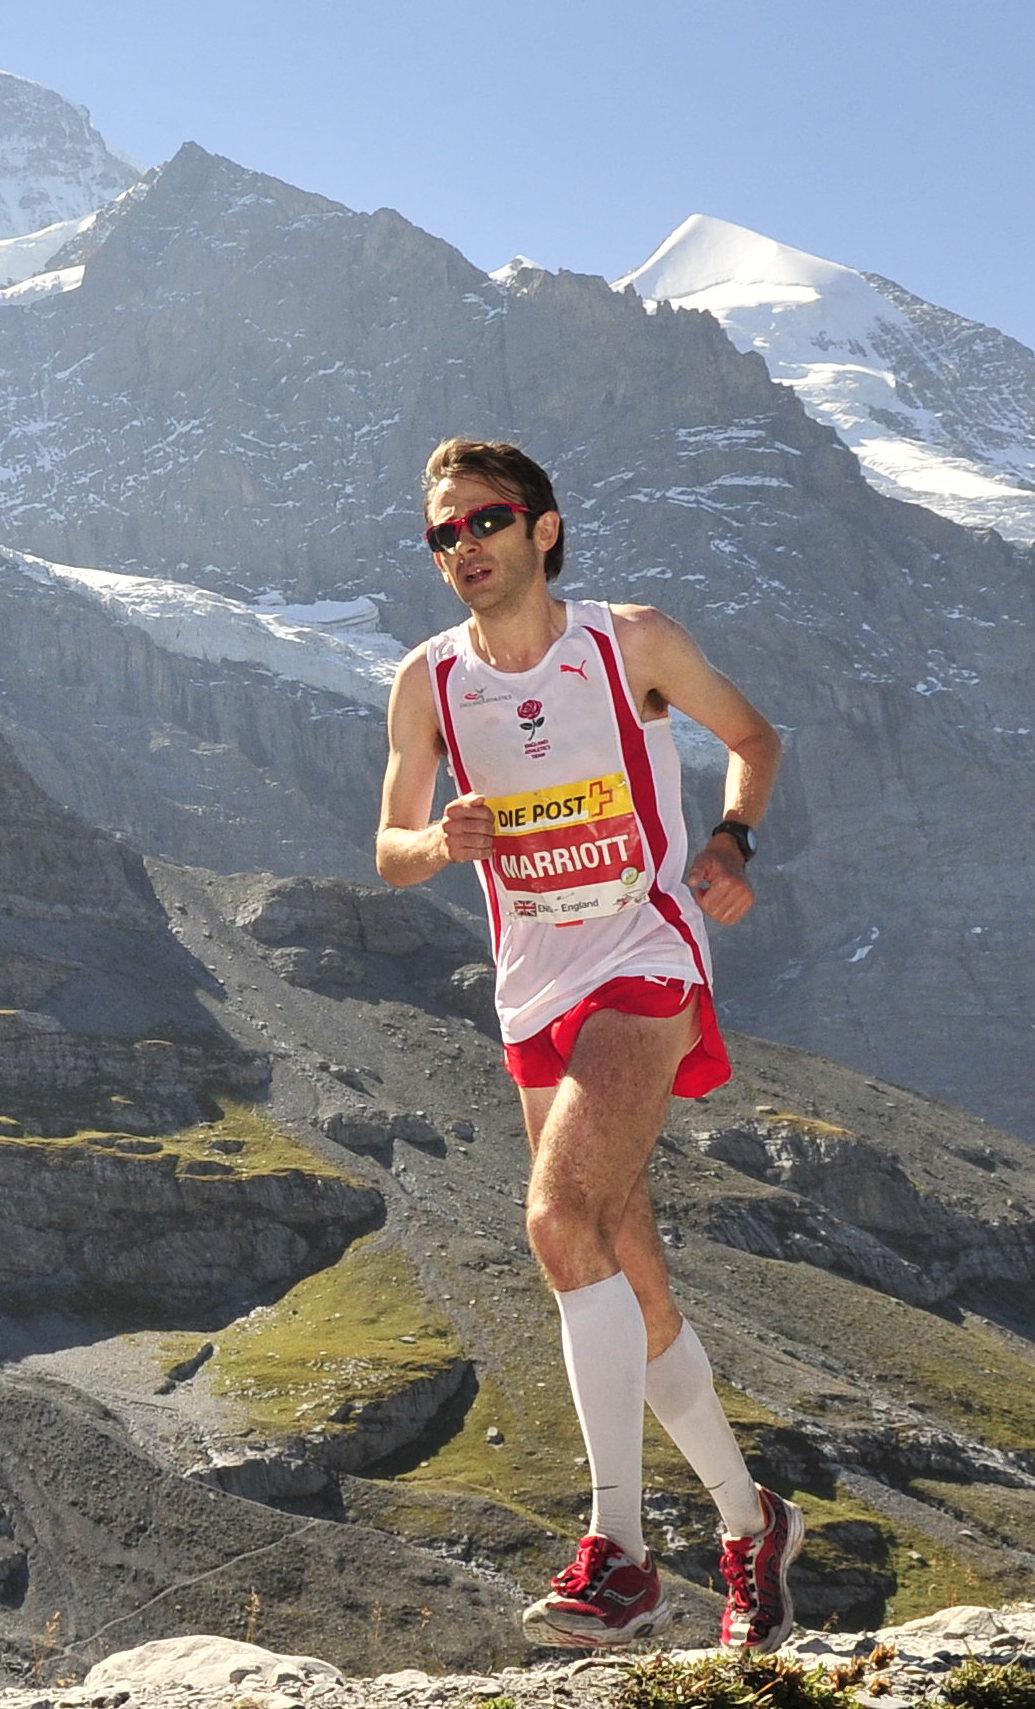 2012 World Long Distance Mountain Running Championships. Jungfrau, Switzerland